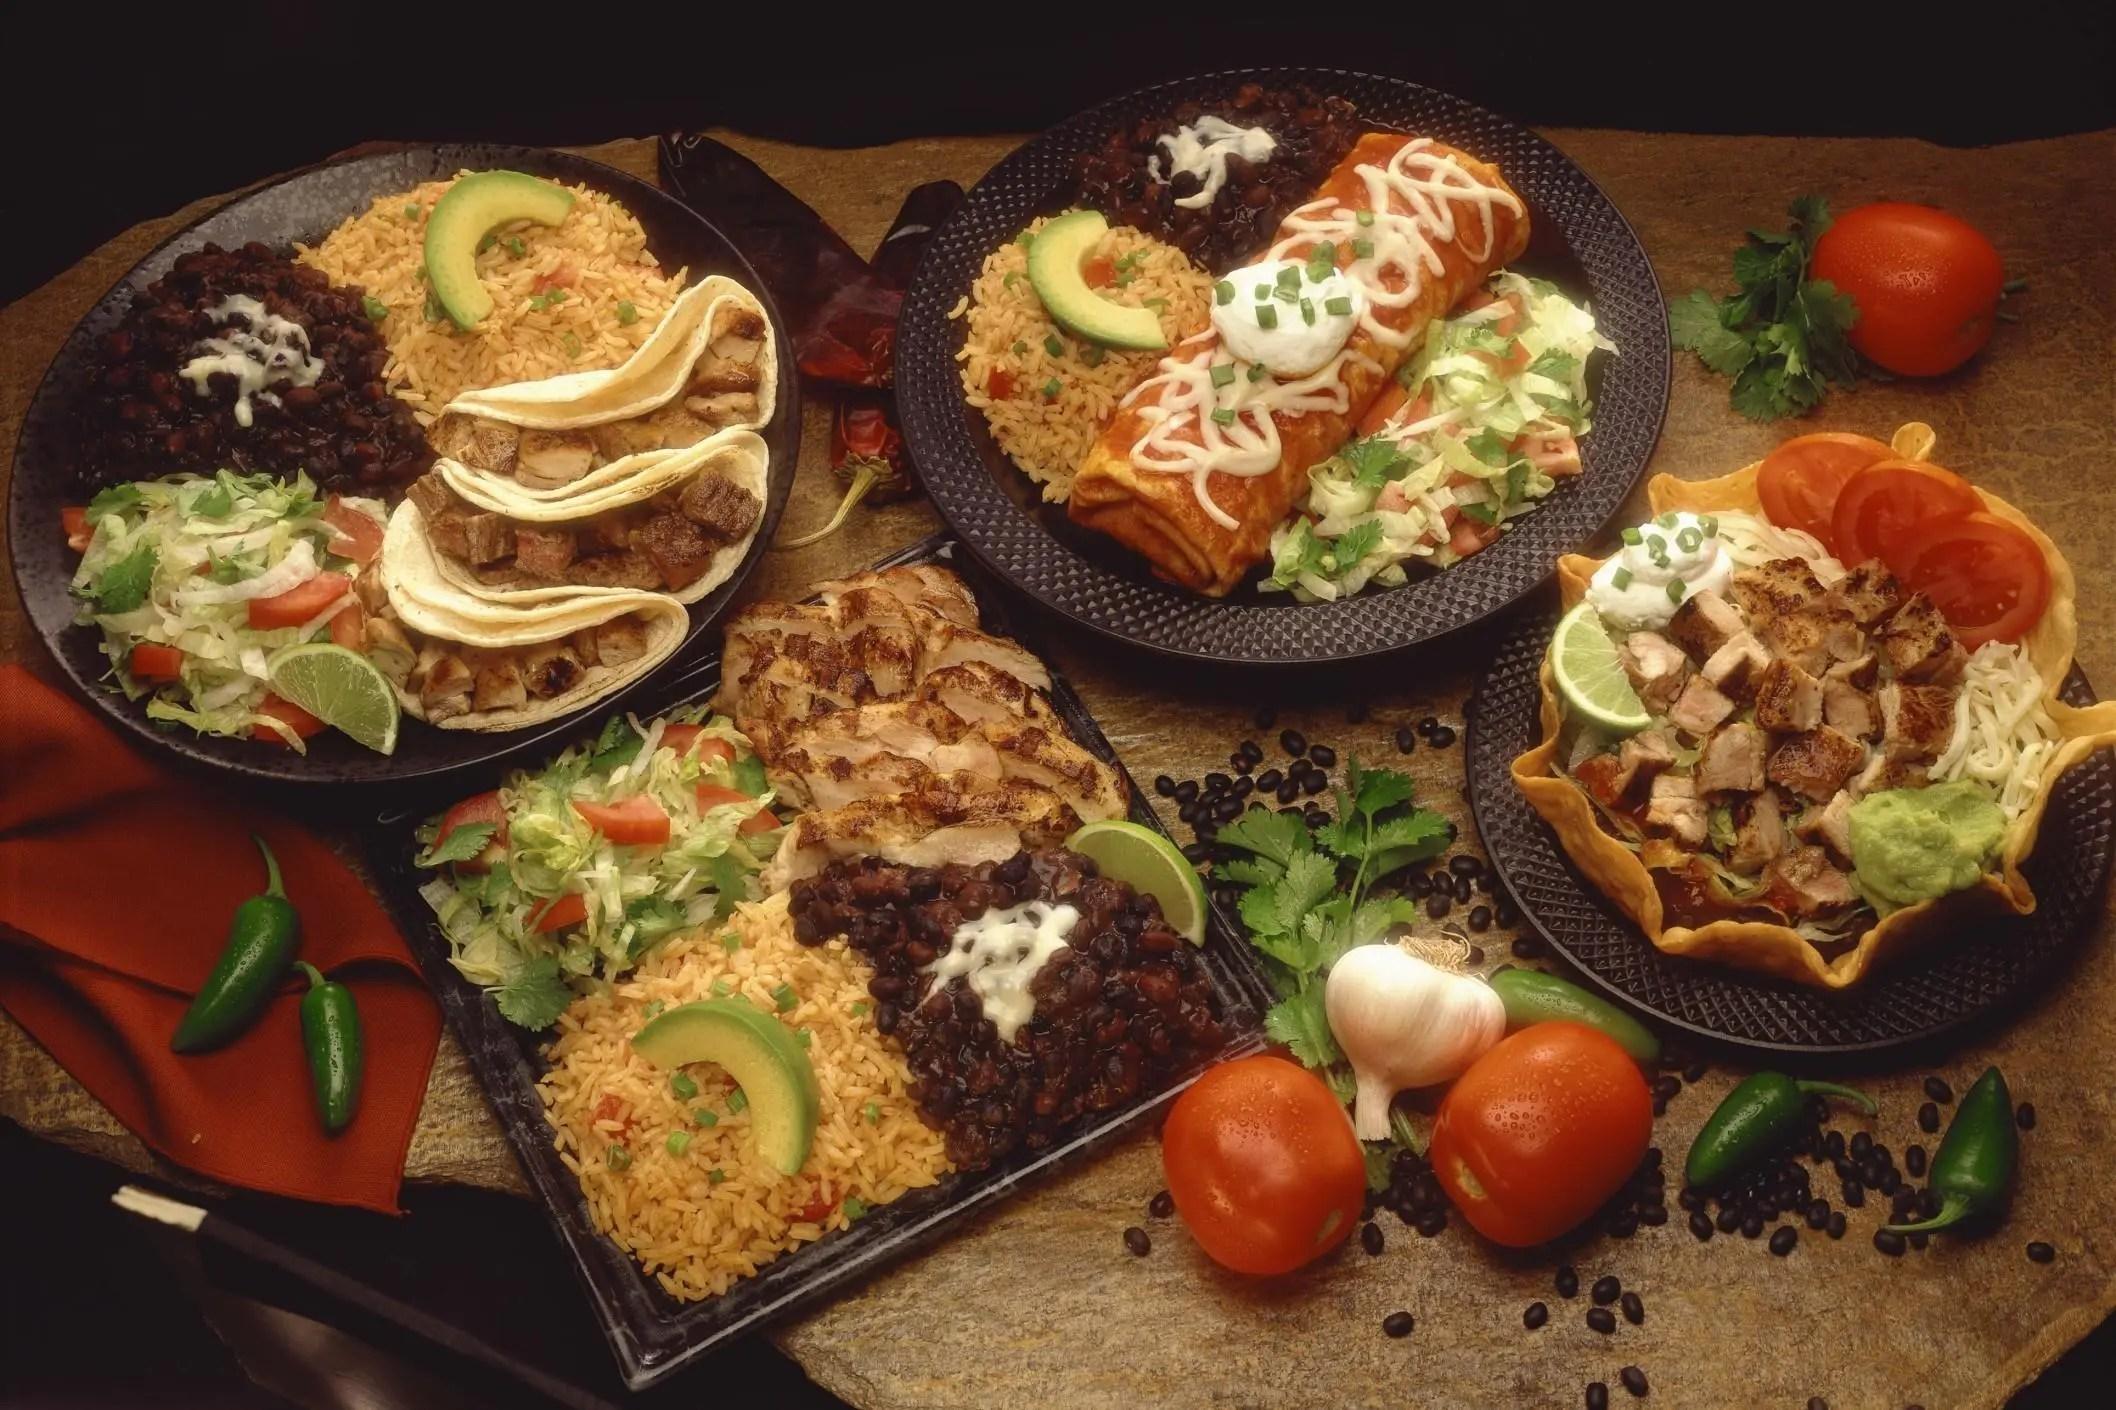 Ricette cucina messicana dolci  Ricette casalinghe popolari